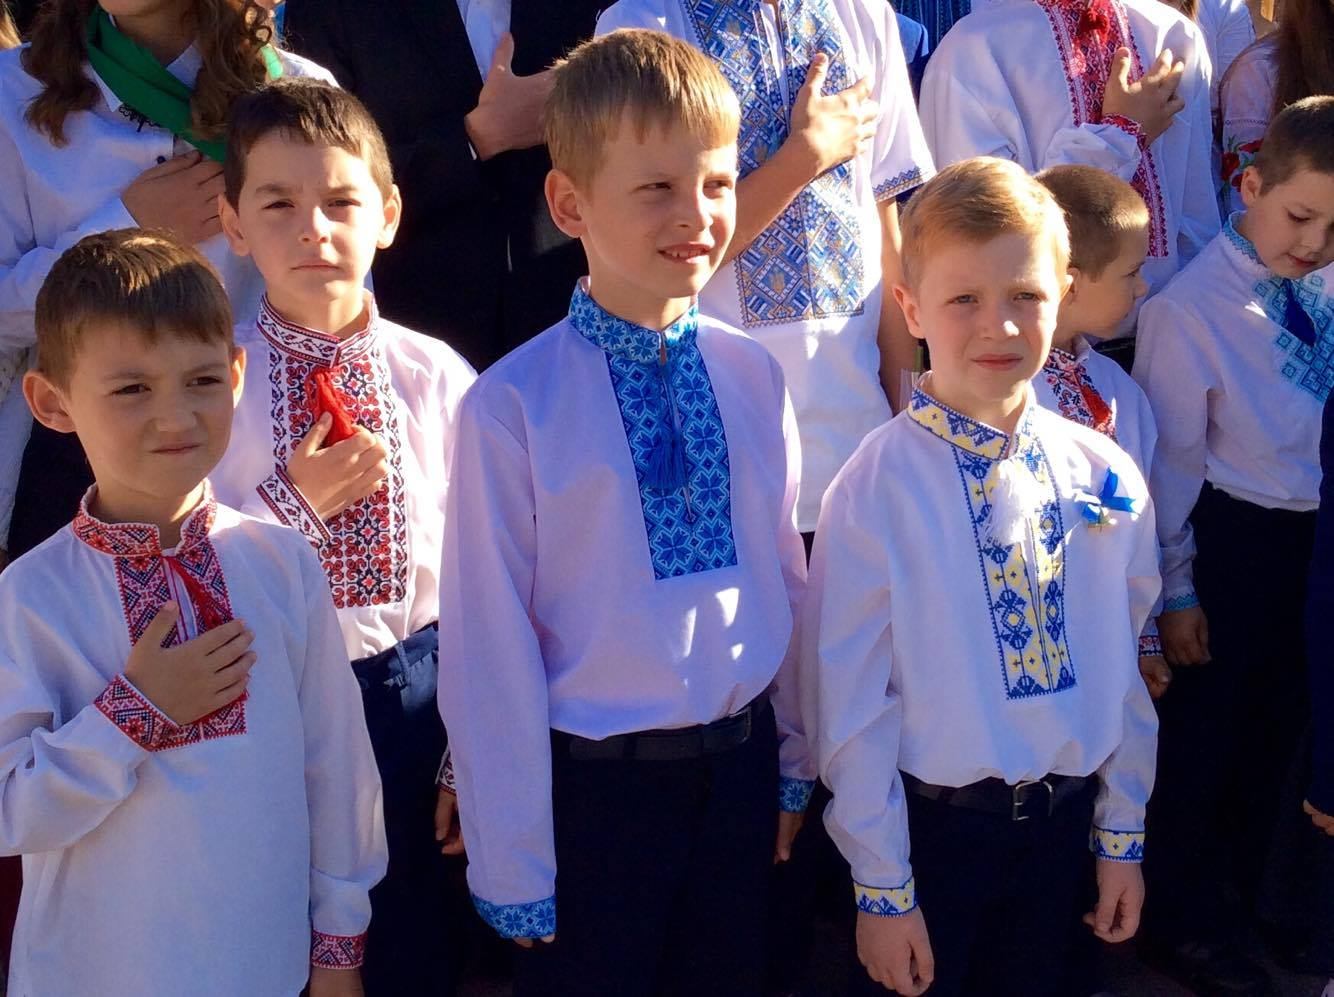 Хмельницький НВК№10 на Першовересень заполонили поліцейські - фото 1